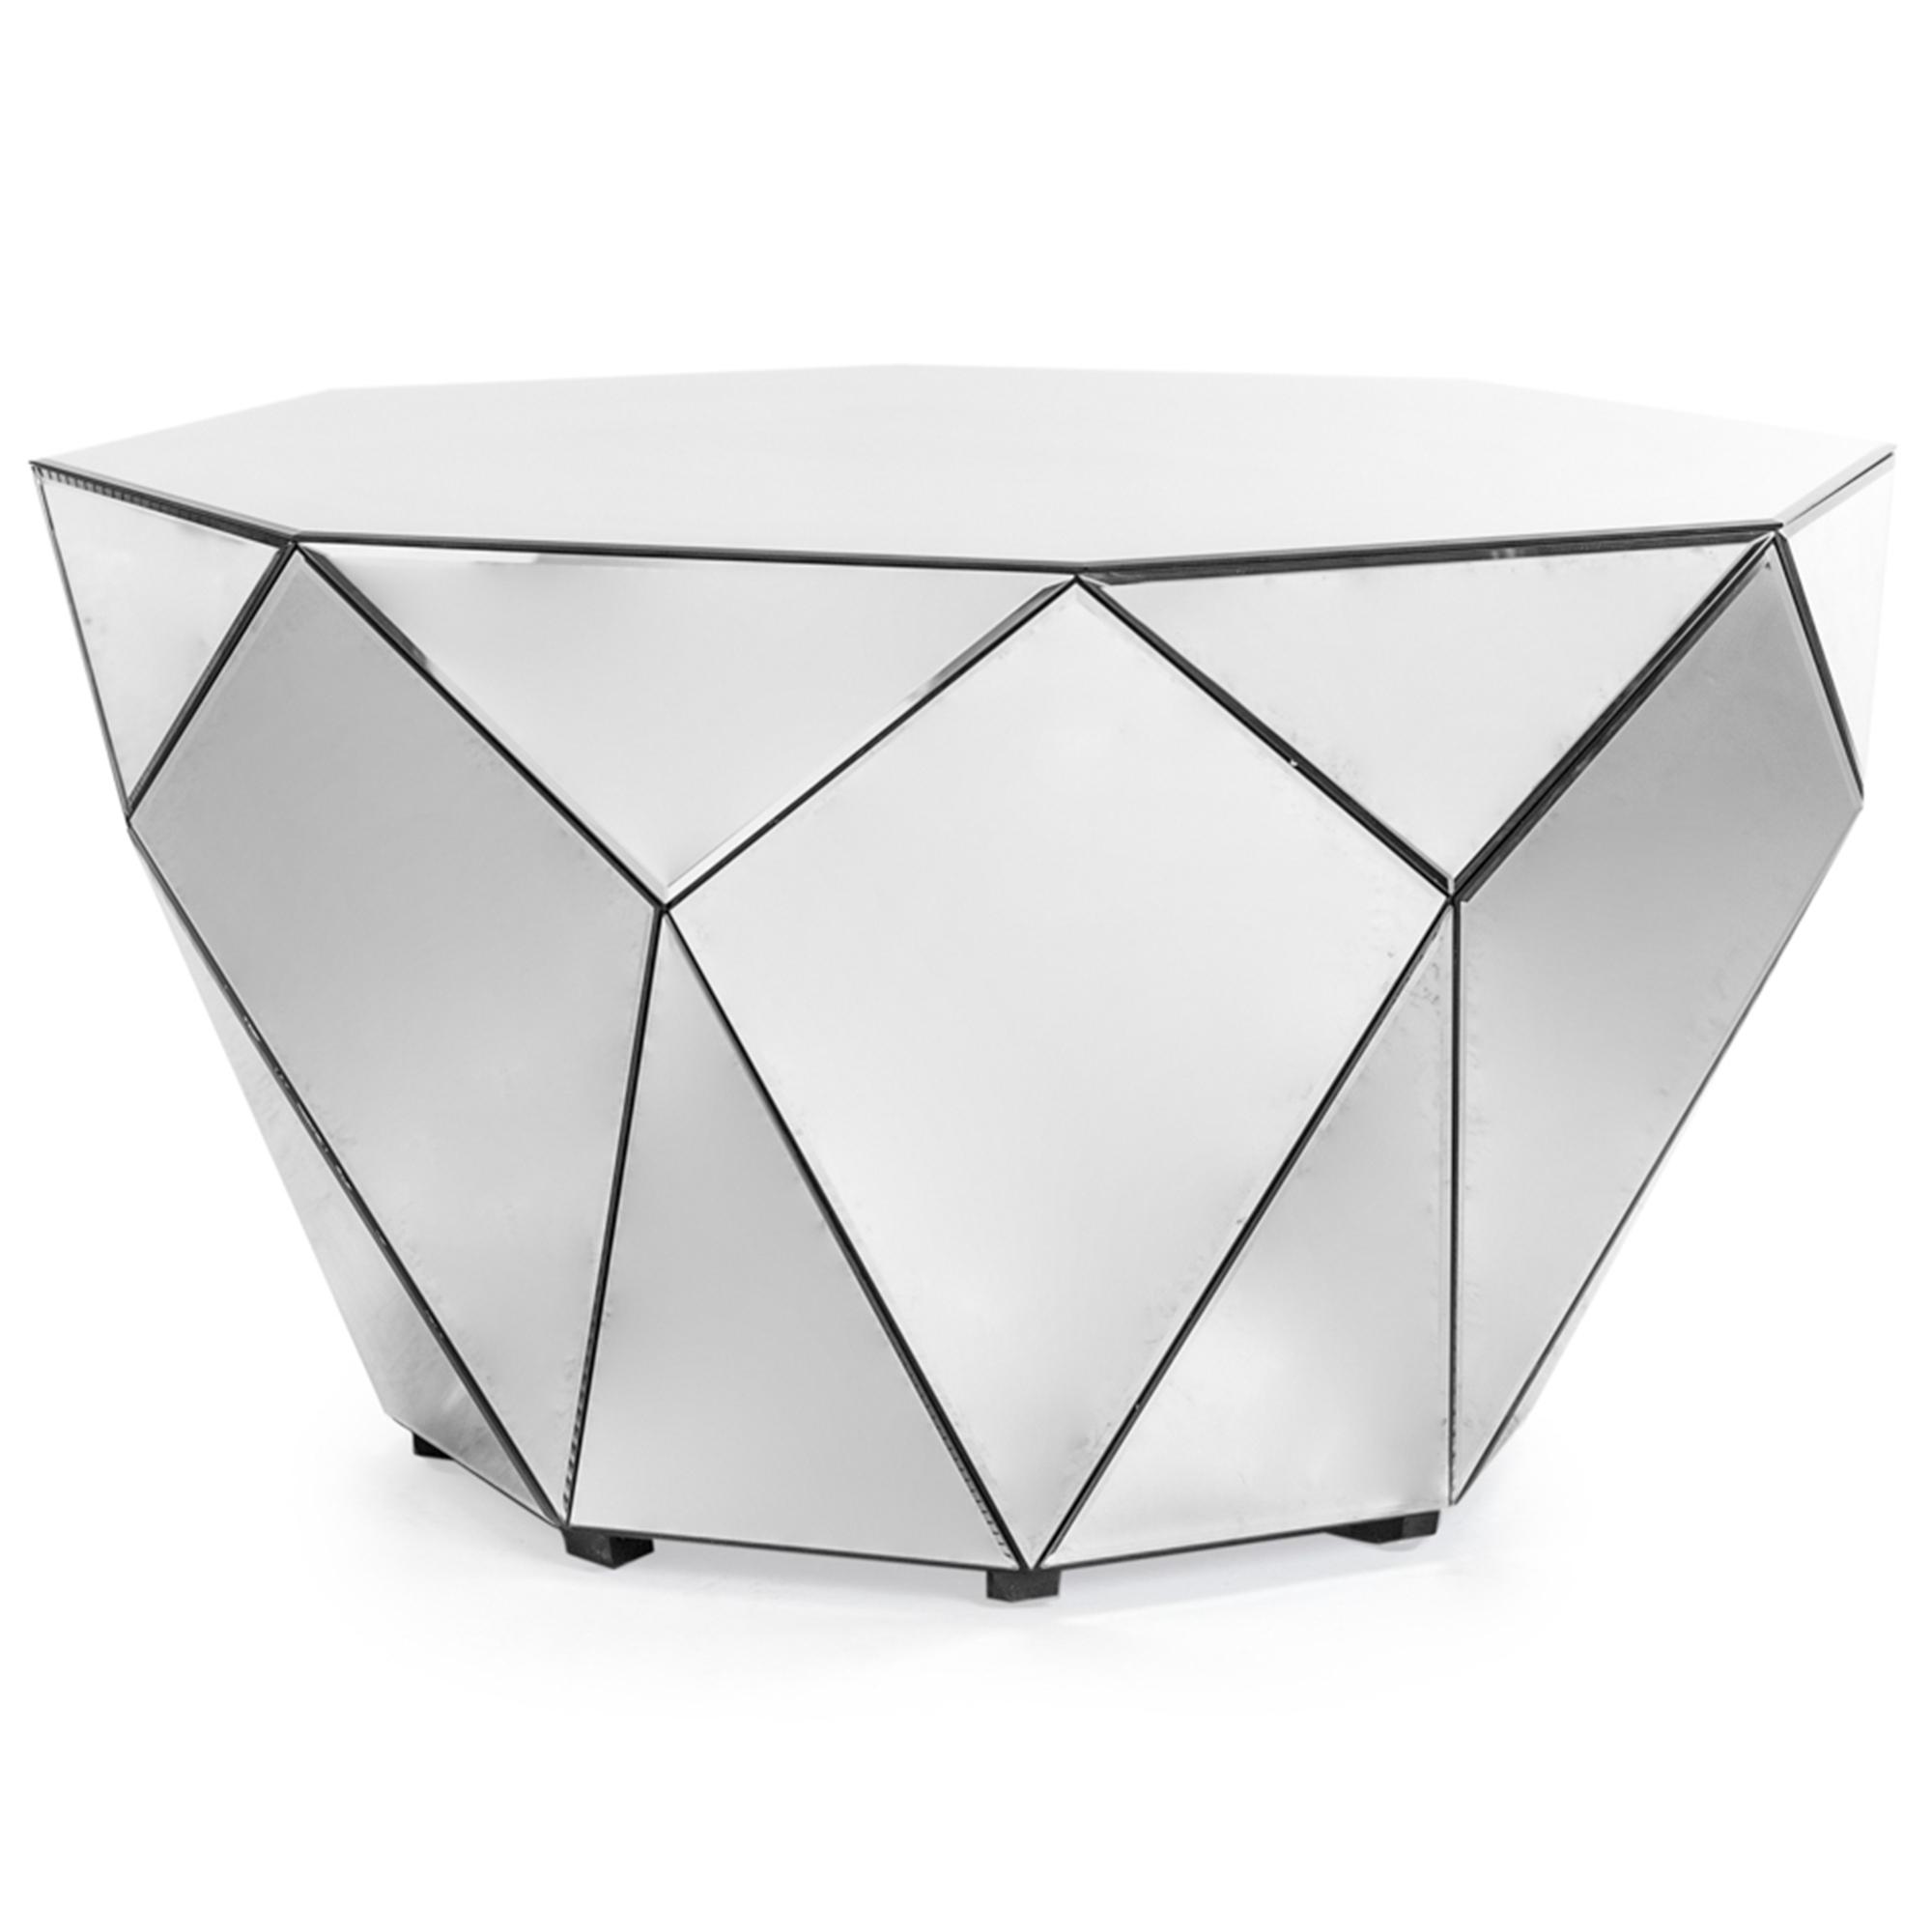 Awesome Venetian Mirrored Diamond Coffee Table Dailytribune Chair Design For Home Dailytribuneorg